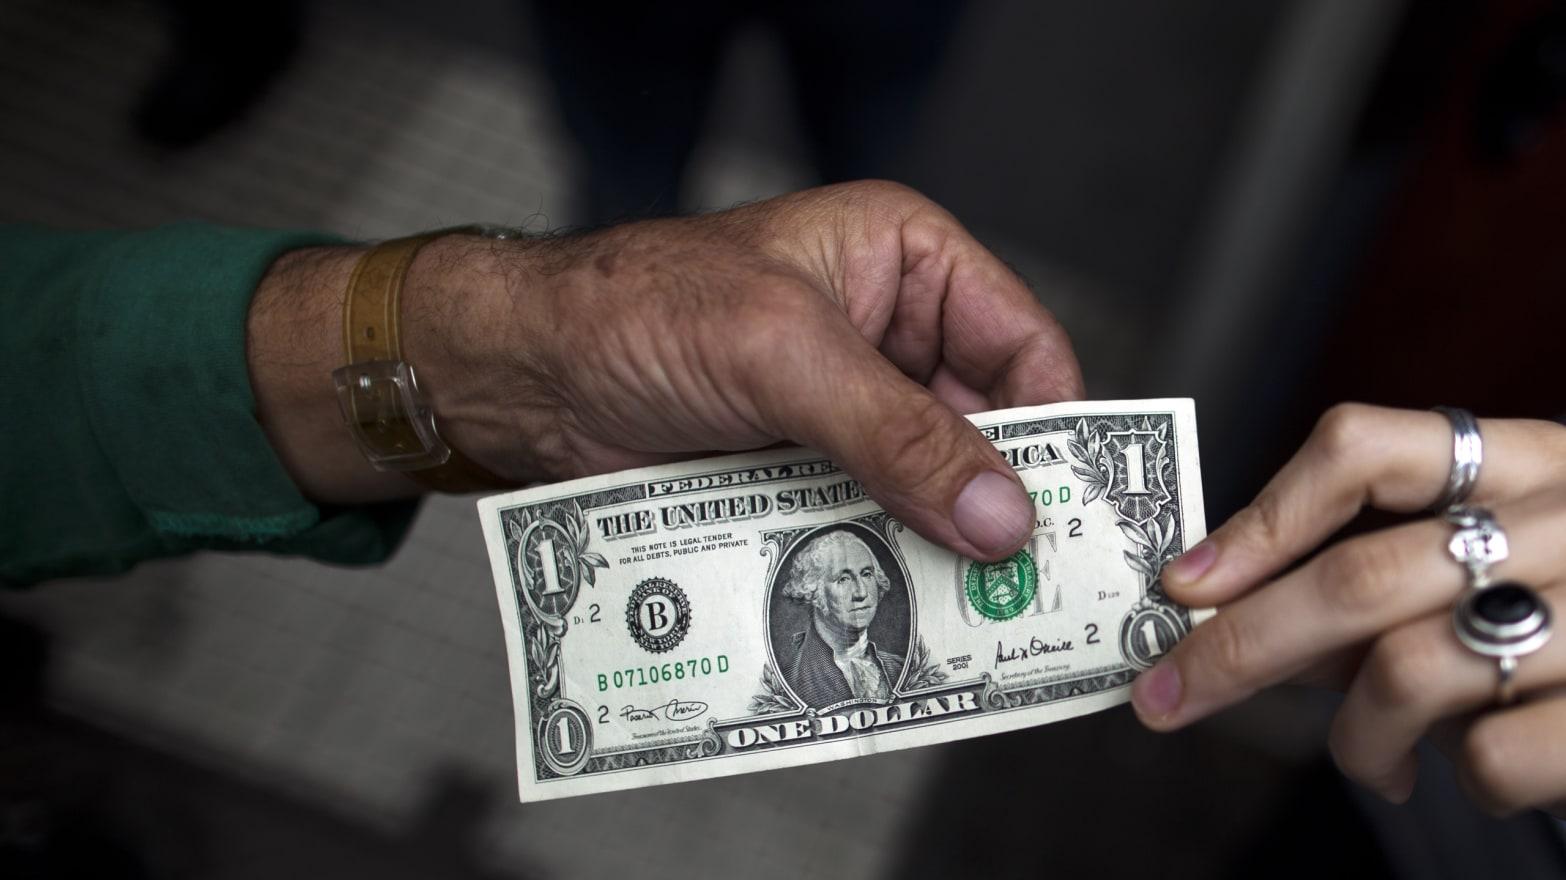 Stockman bitcoins to dollars bet on royal rumble